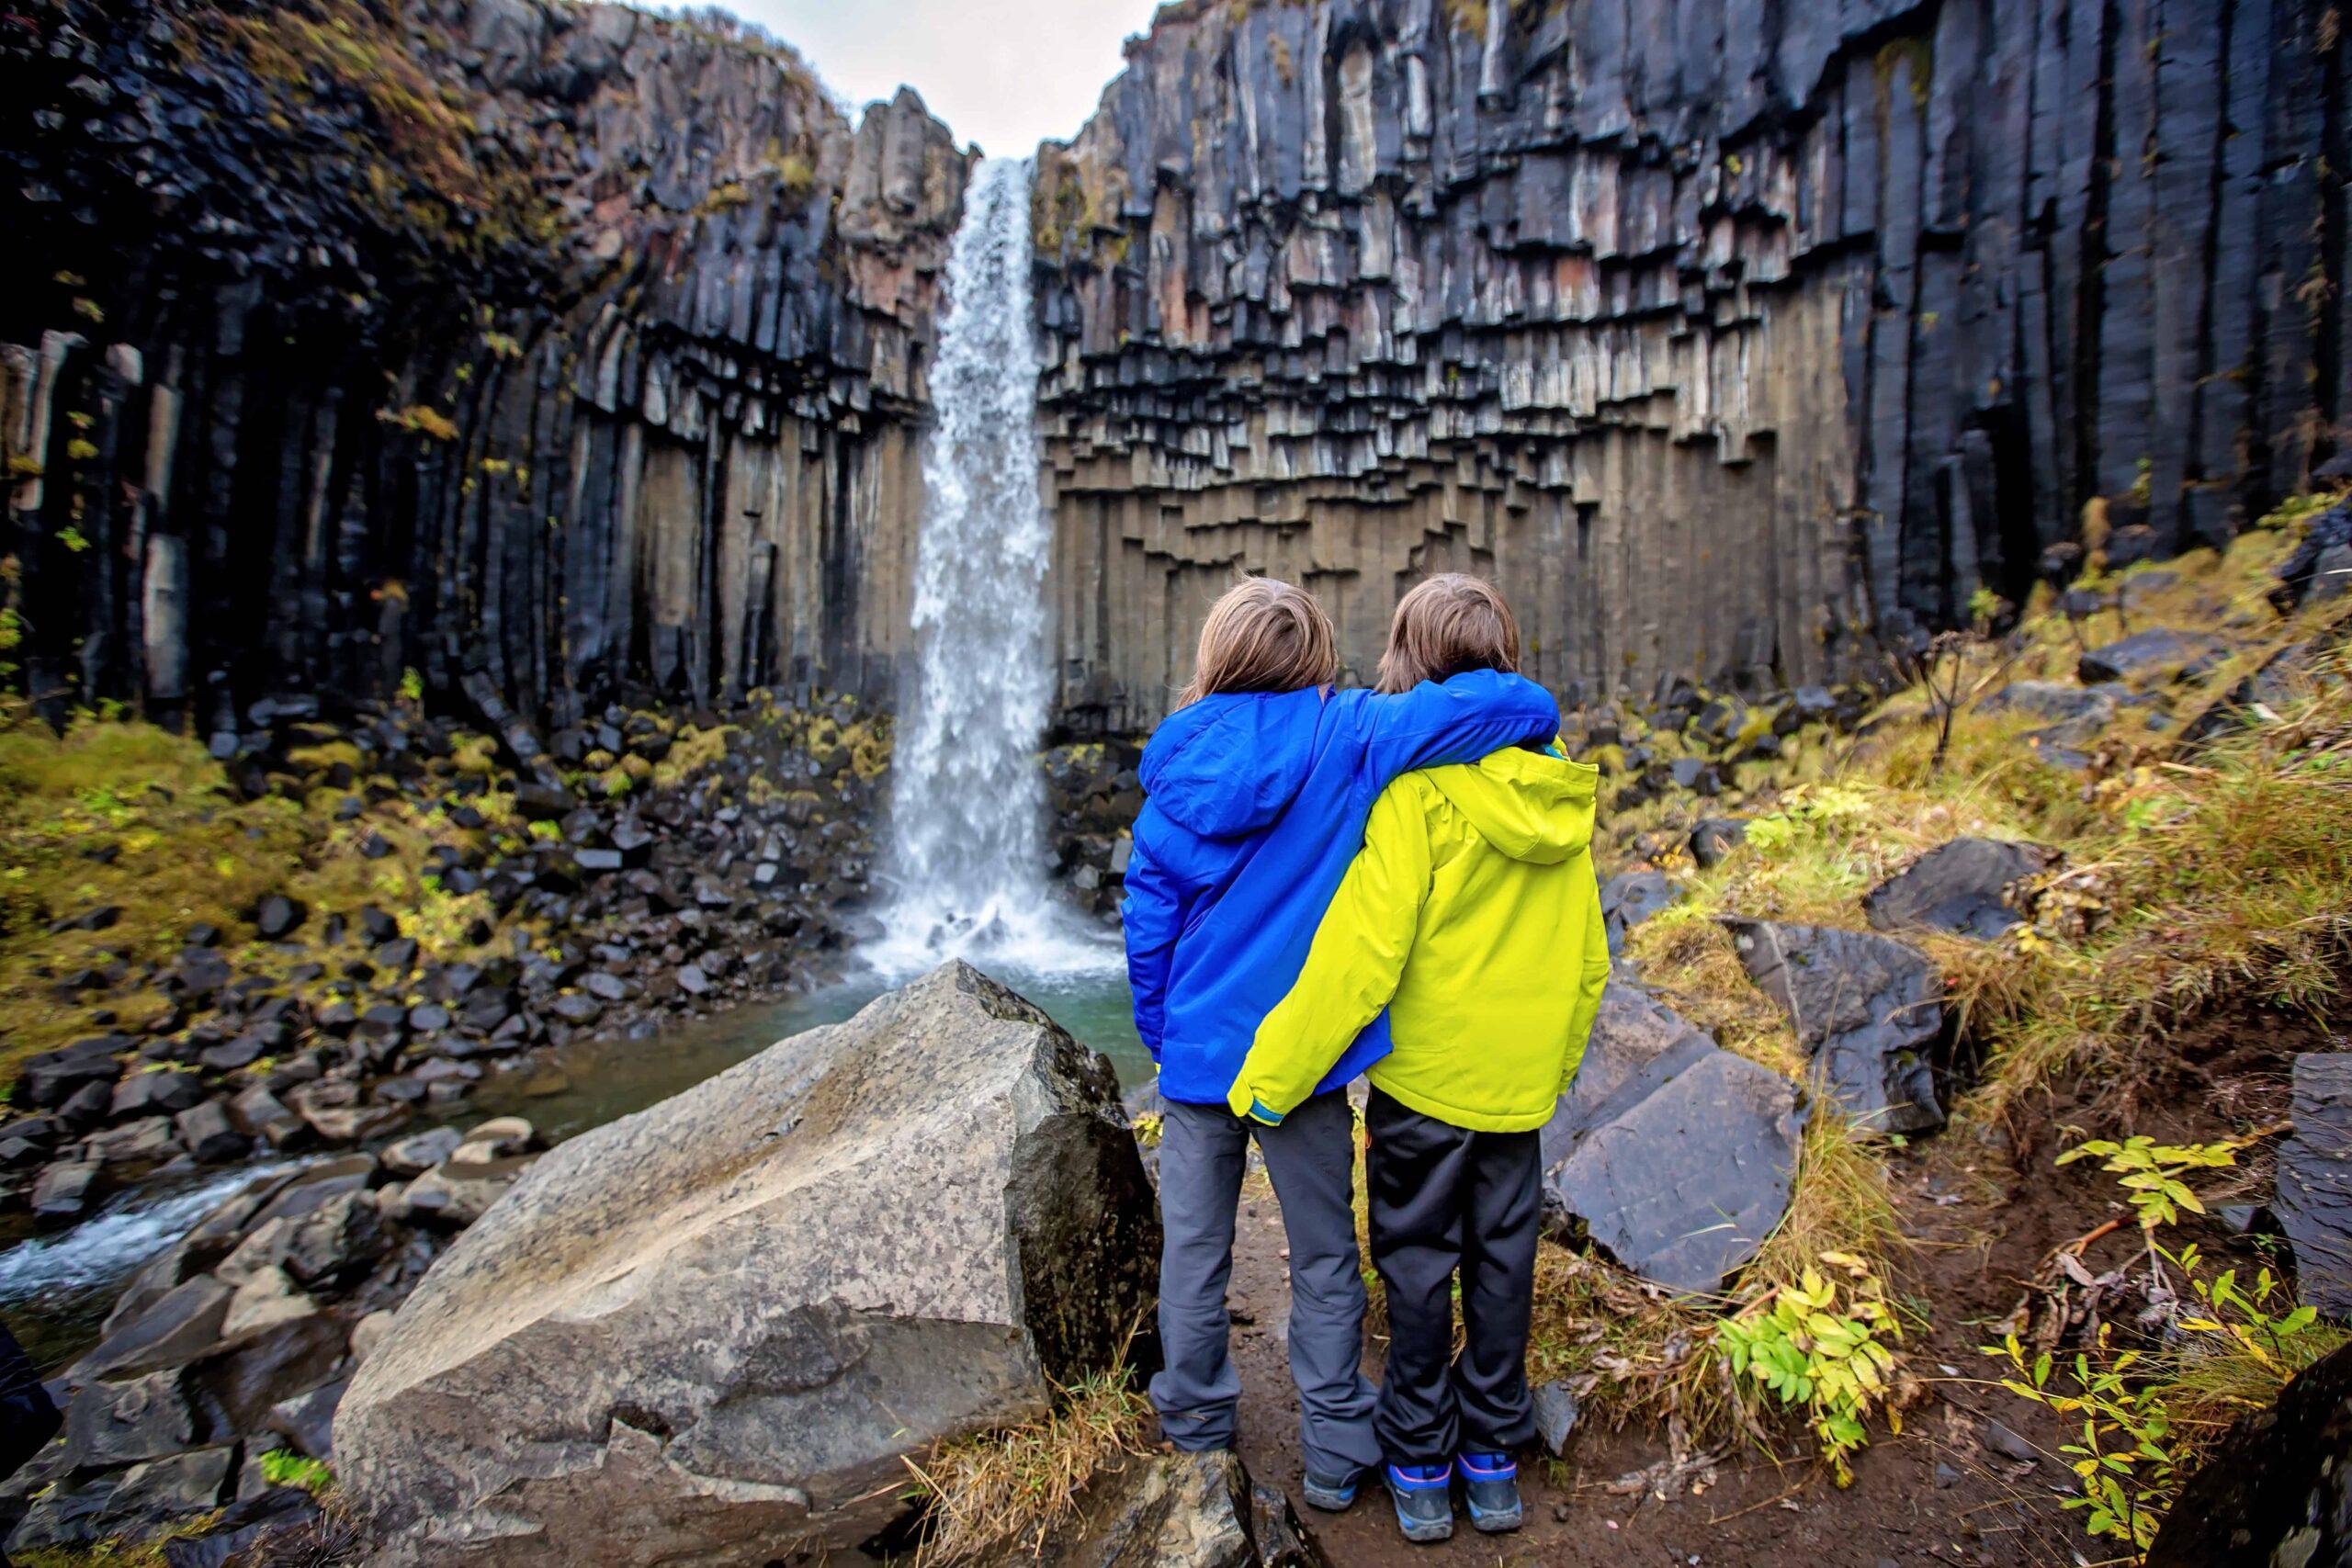 brothers at Svartifoss waterfall in Skaftafell Vatnajökull National Park in south Iceland